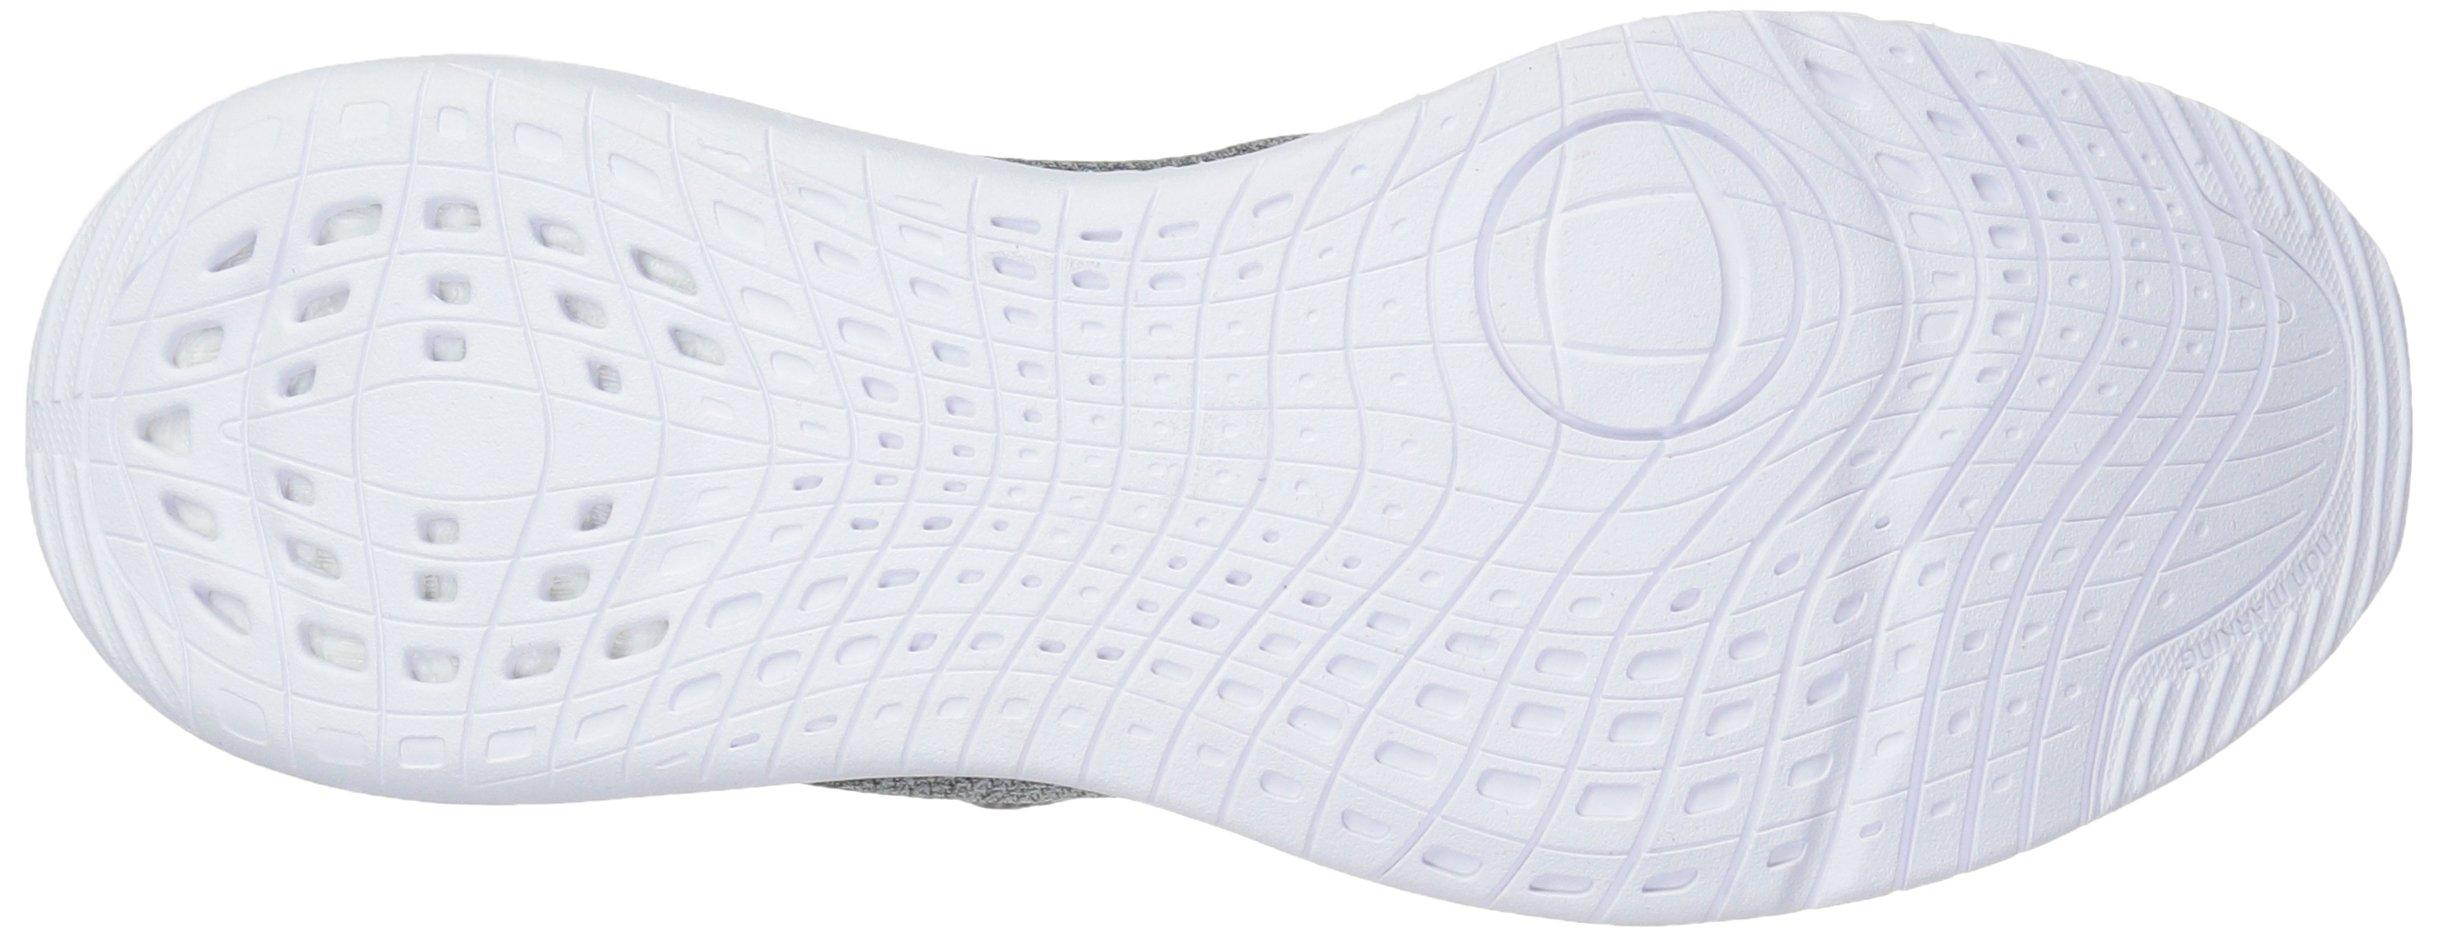 71OPiwAUaoL - adidas Womens Pure Boost x tr Zip Low Top Slip On Fashion Sneakers